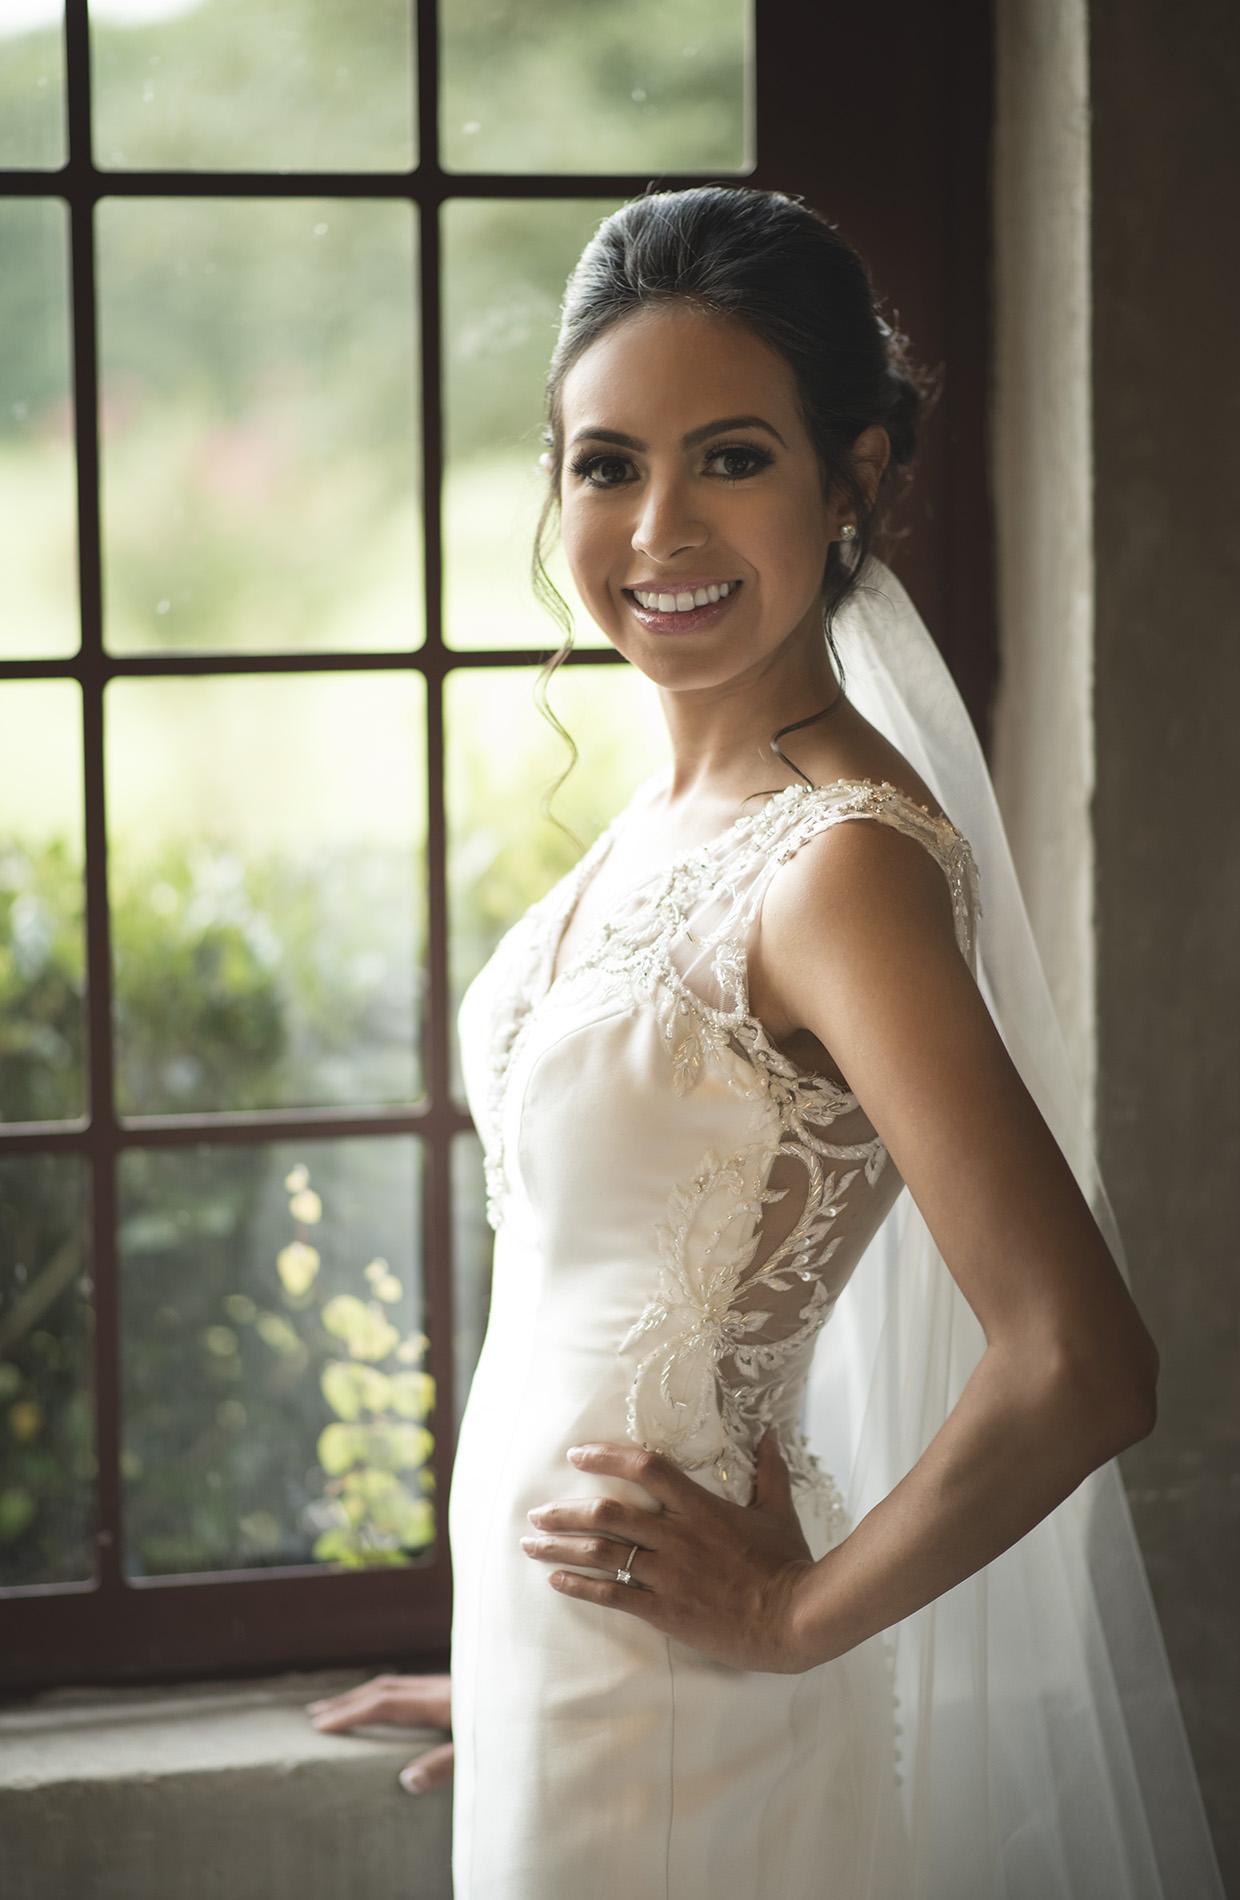 Houston-venue-Olde-Dobbin-Station-Romantic-Classic-Wedding-Photographer-046.jpg